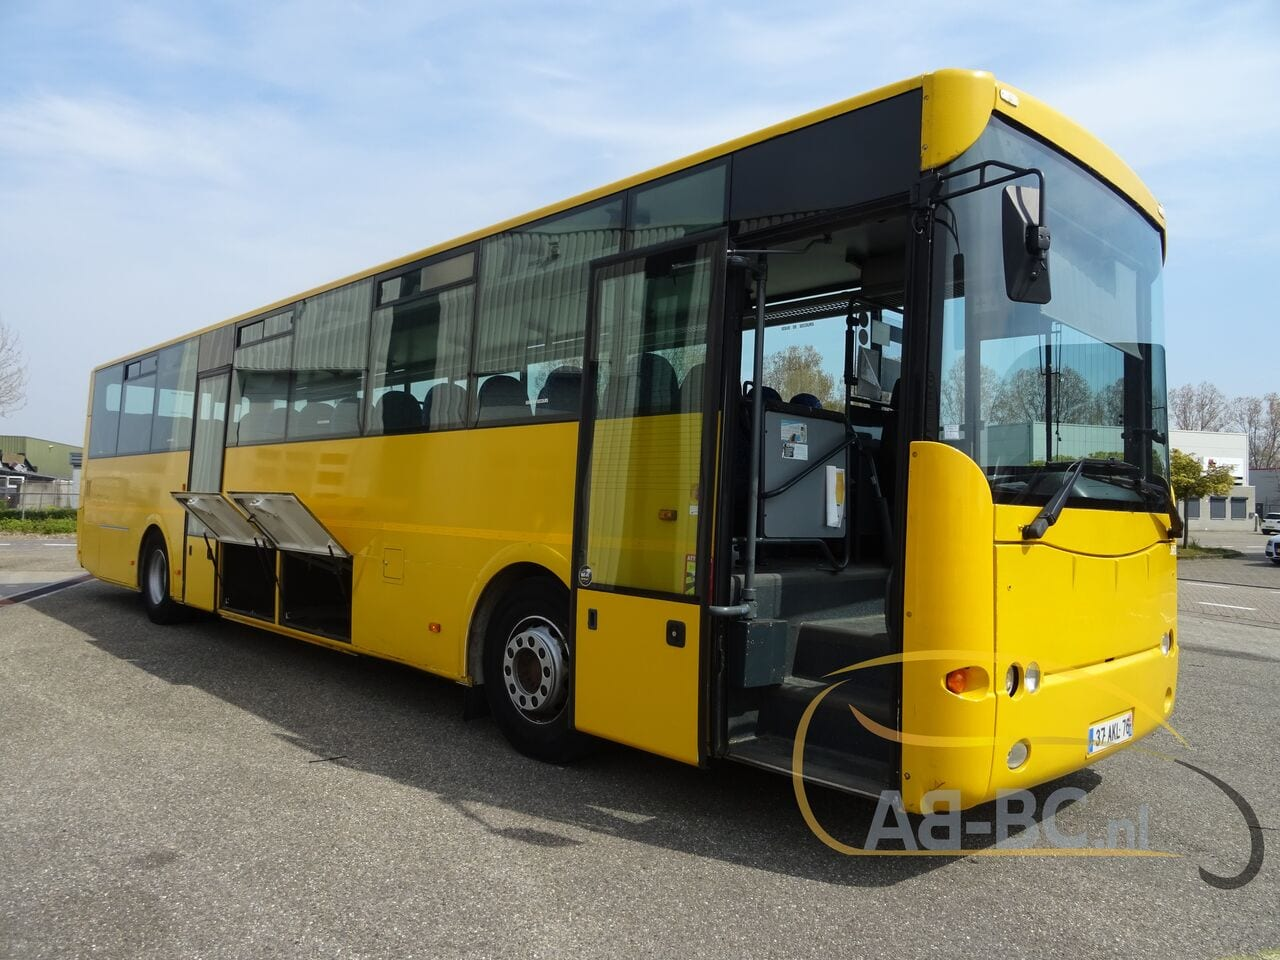 interurban-busMAN-Fast-64-seats---1619619746036026462_big_a06aa4560fe2734342b0e69e9f96bf6c--21042817163019598600